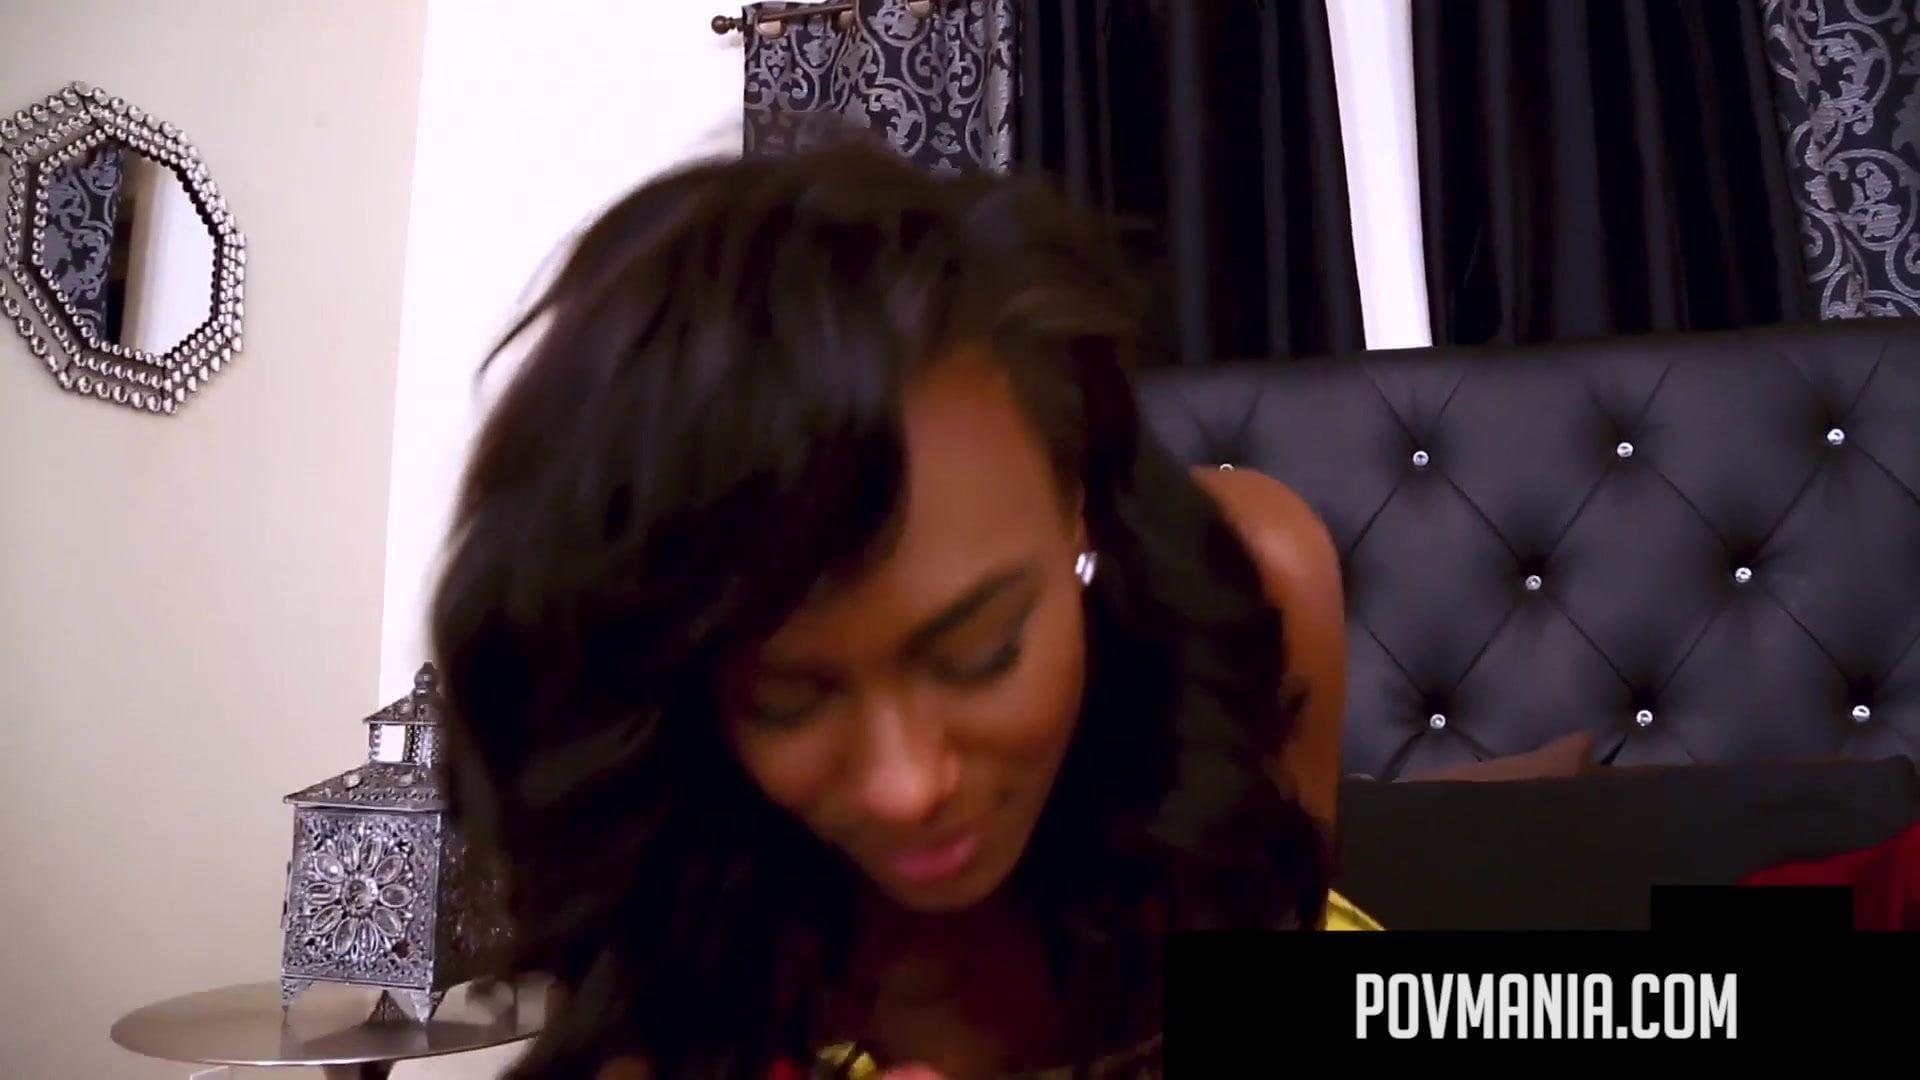 POVMania.com— Dark Skinned Akyra Lee Mouth Fucks Miles Long